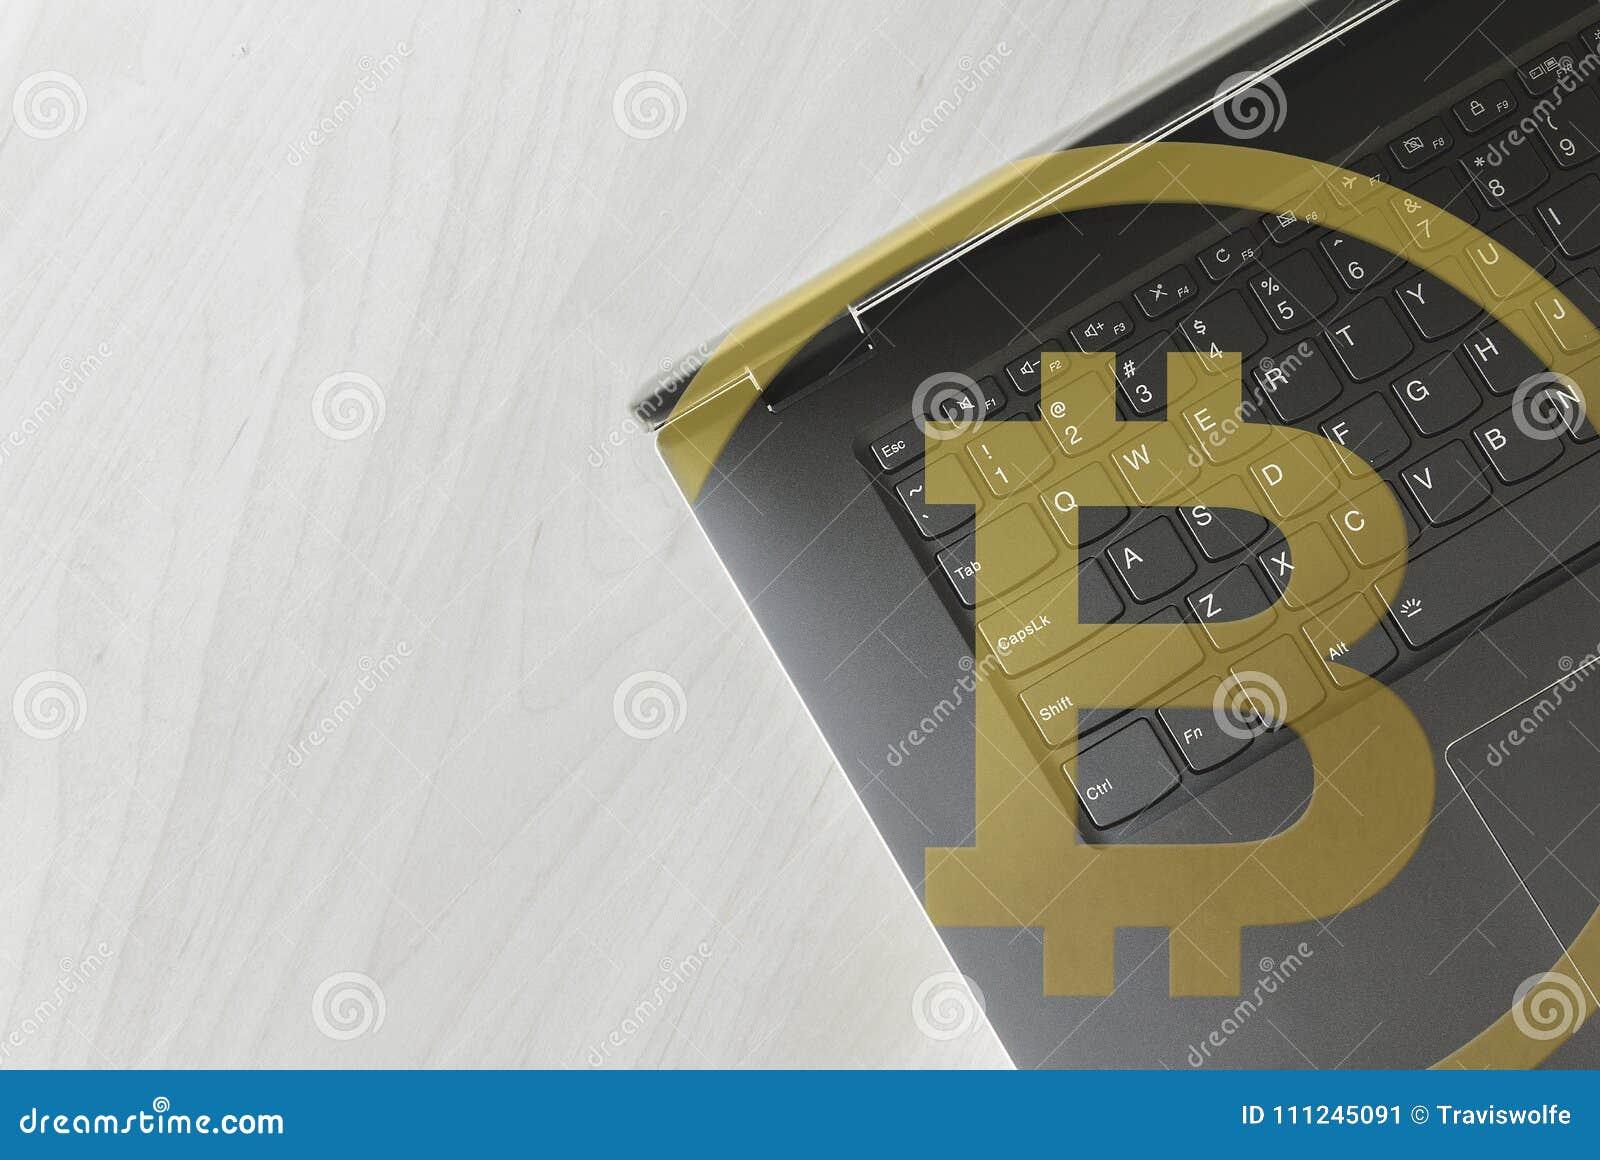 bitcoin 21 bitcoin procentinė rinkos riba